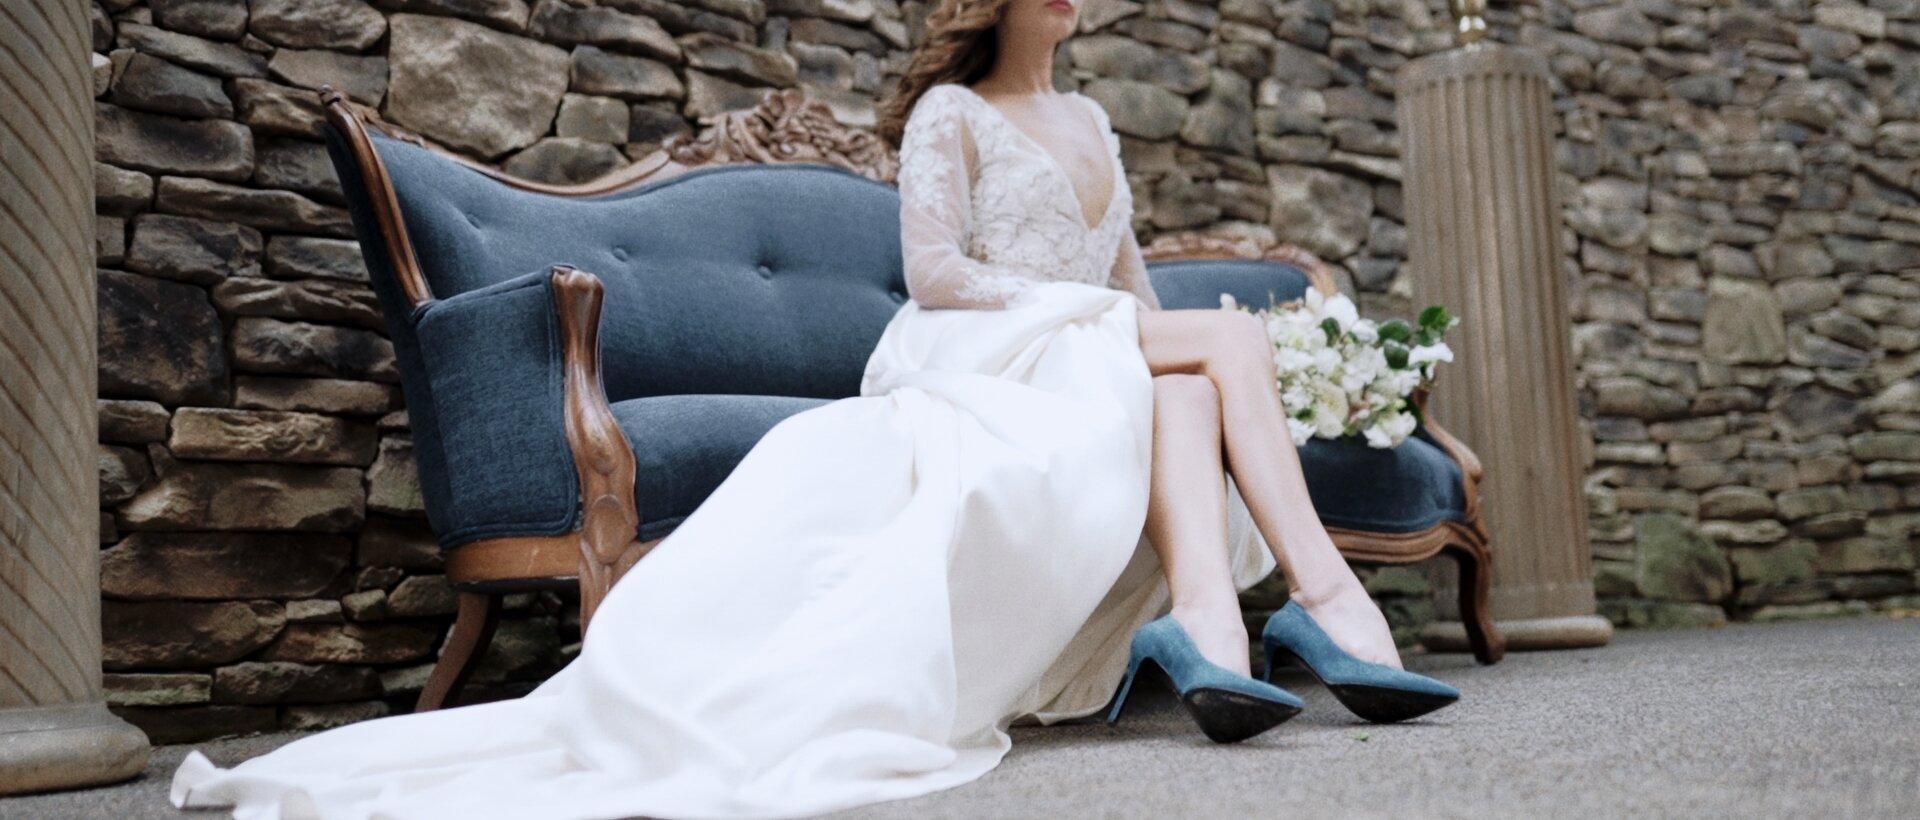 montage-kapalua-wedding-styled-shoot-_3.1.18.jpg